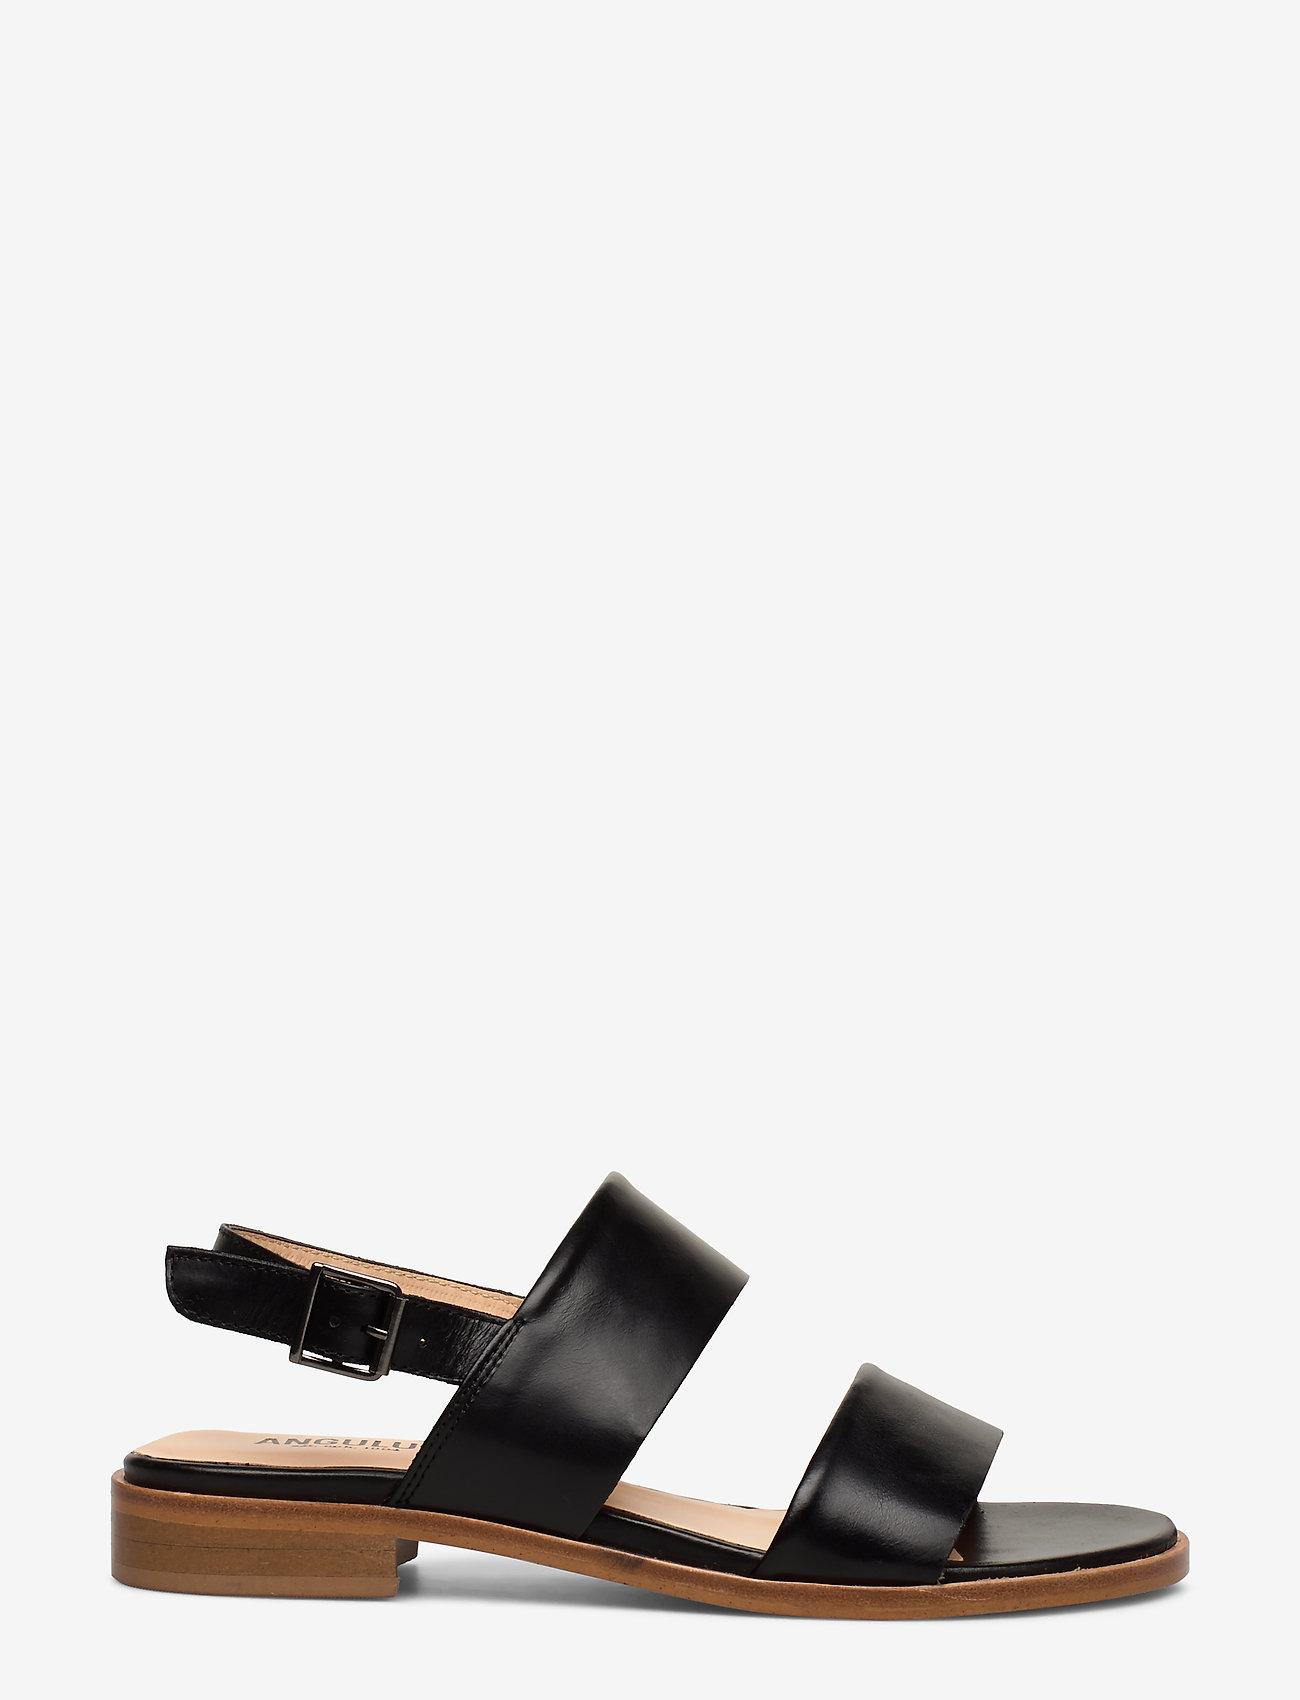 ANGULUS - Sandals - flat - flache sandalen - 1835 black - 1